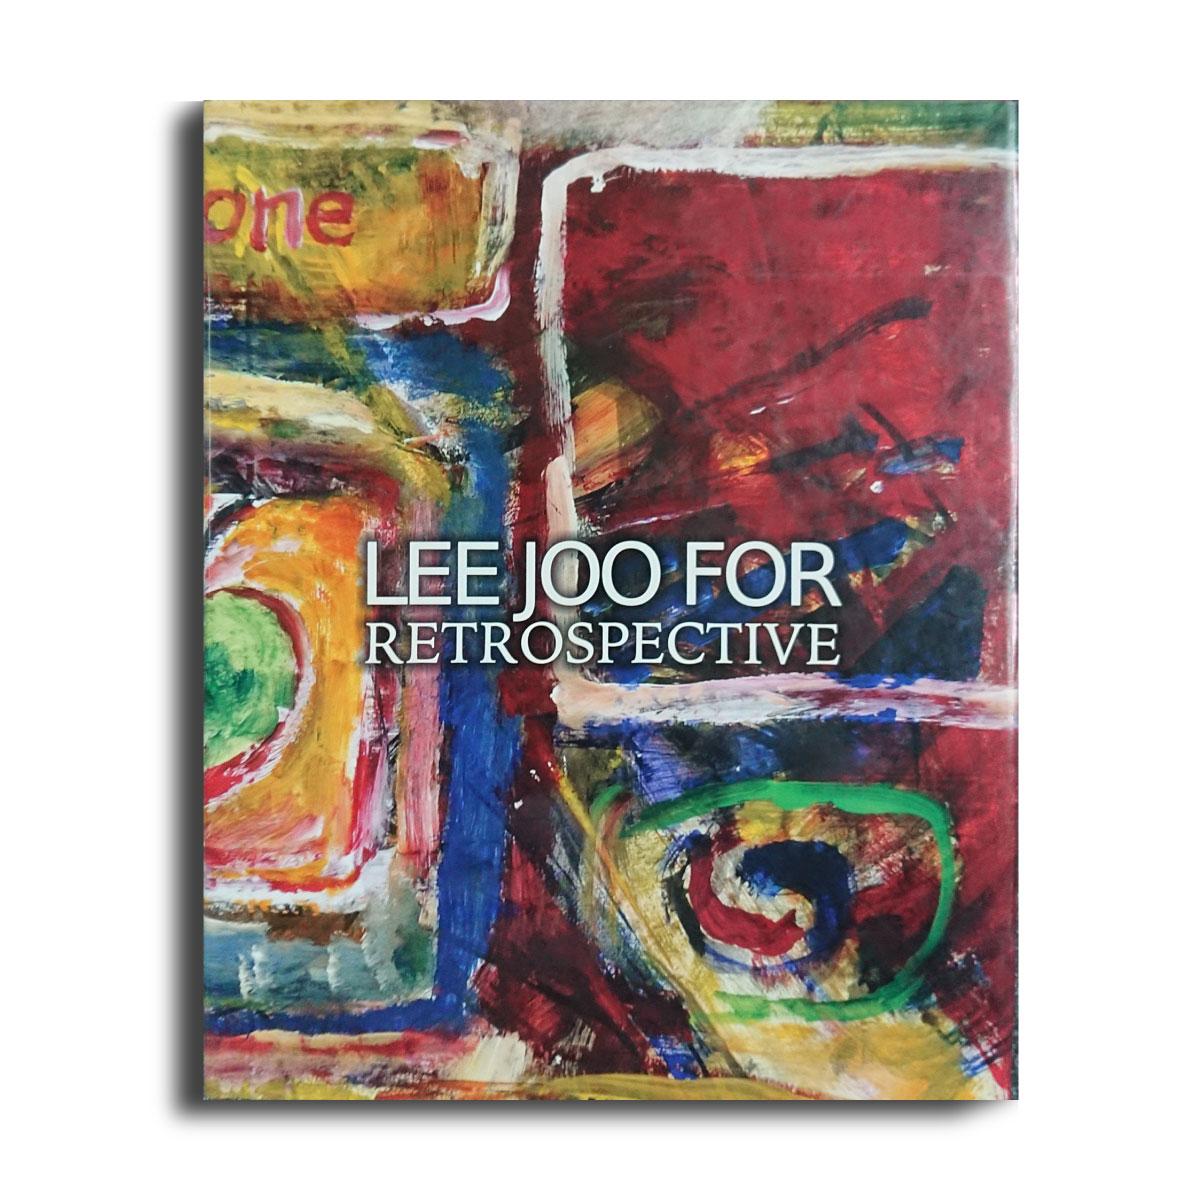 Lee Joo For Retrospective